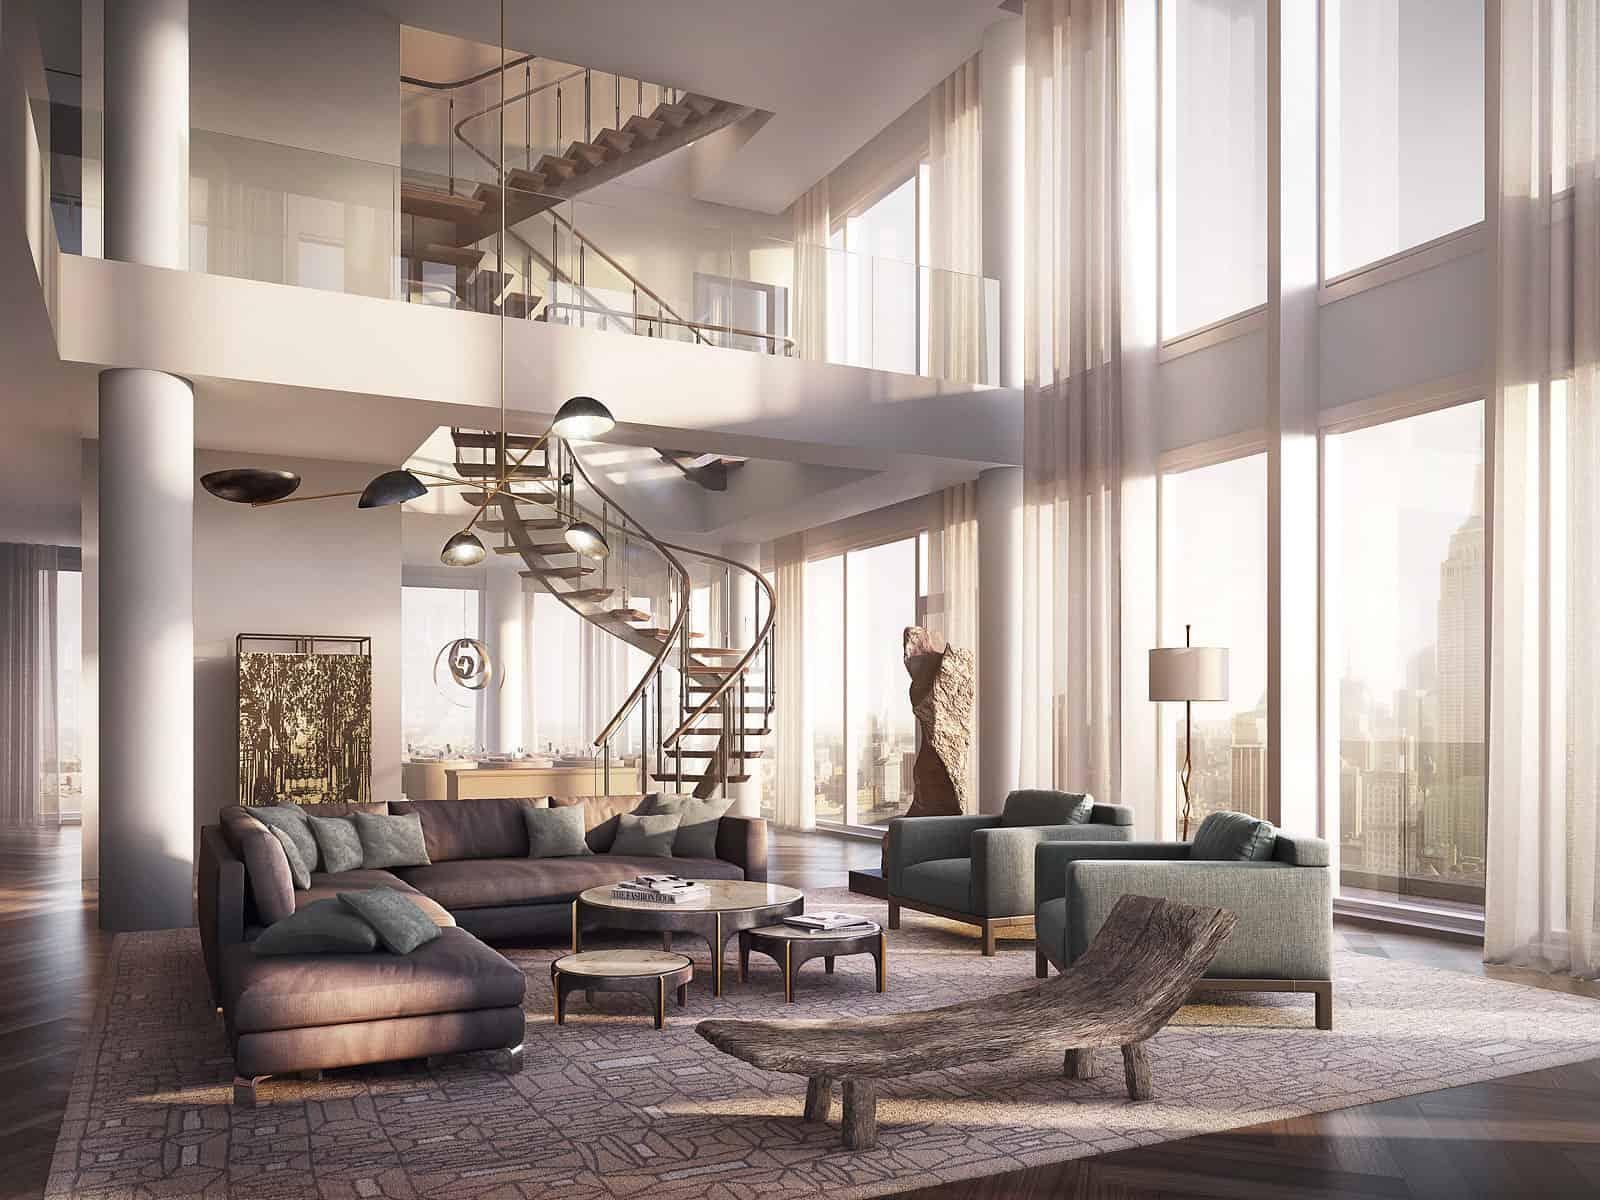 billionaire rupert murdoch s new pad in new york city